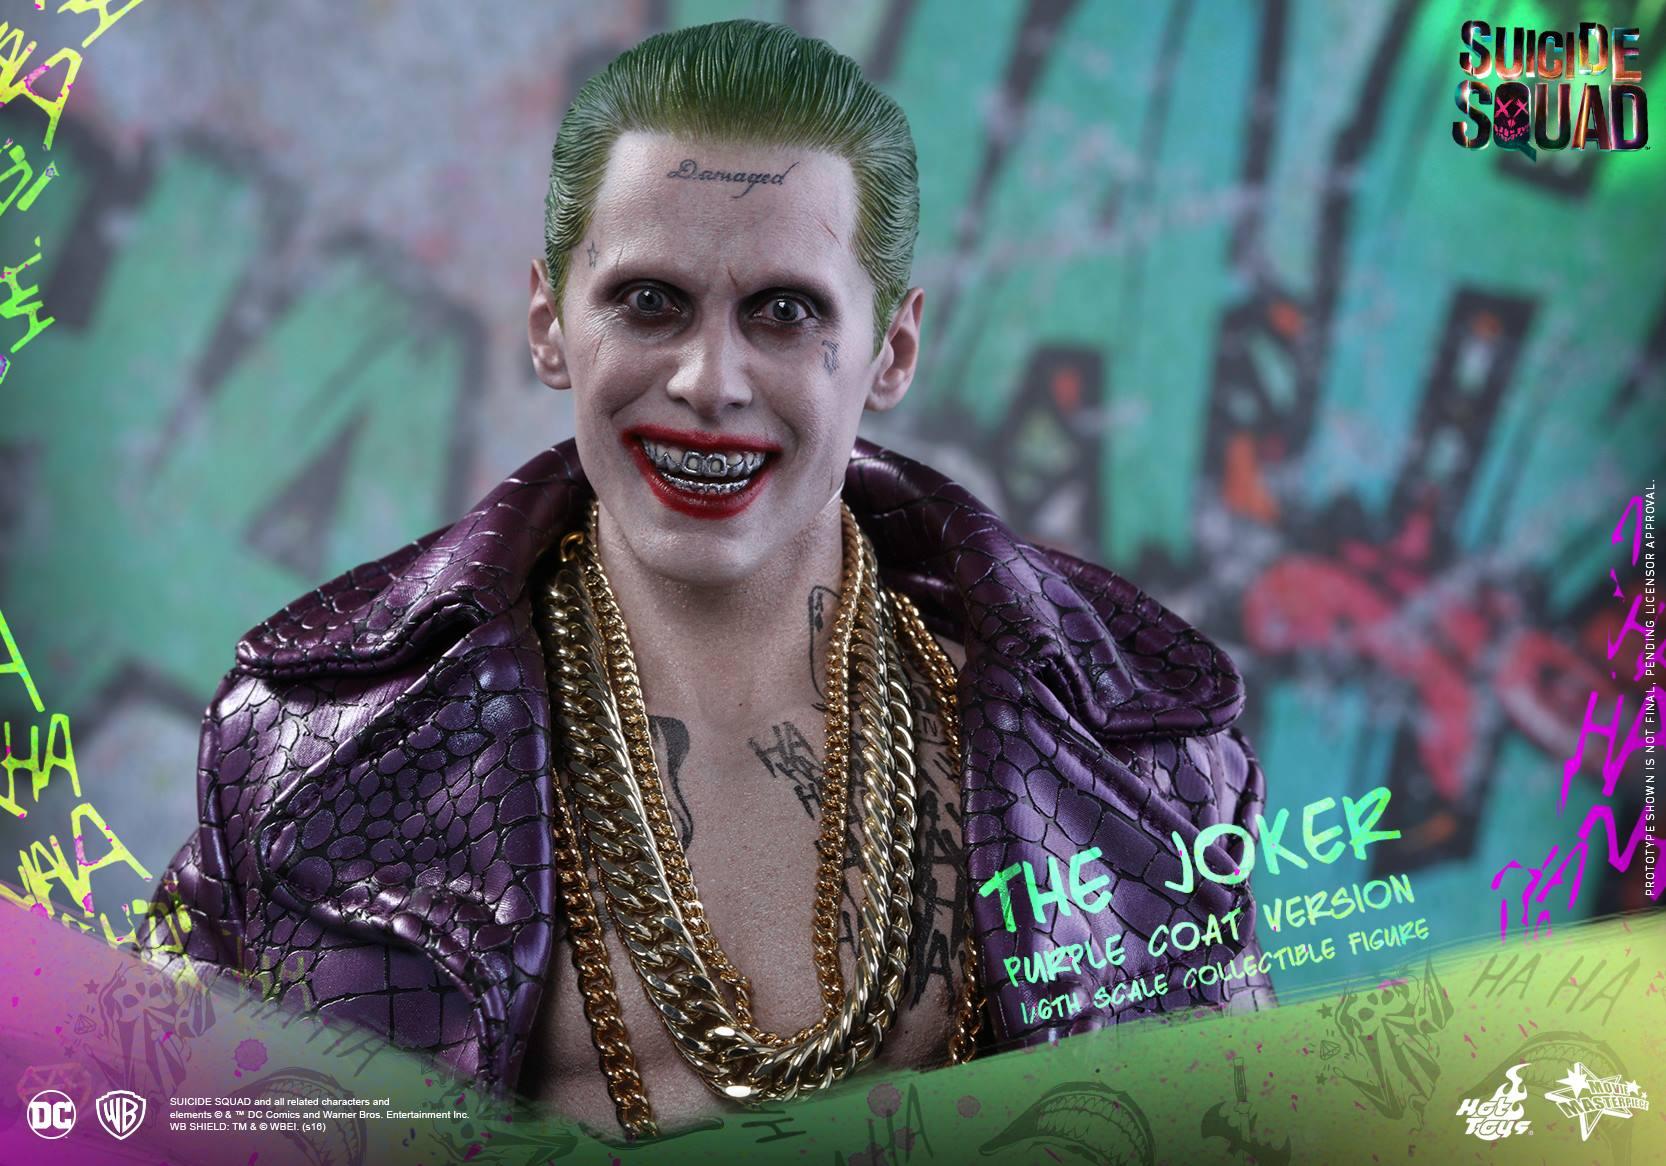 ht-joker12